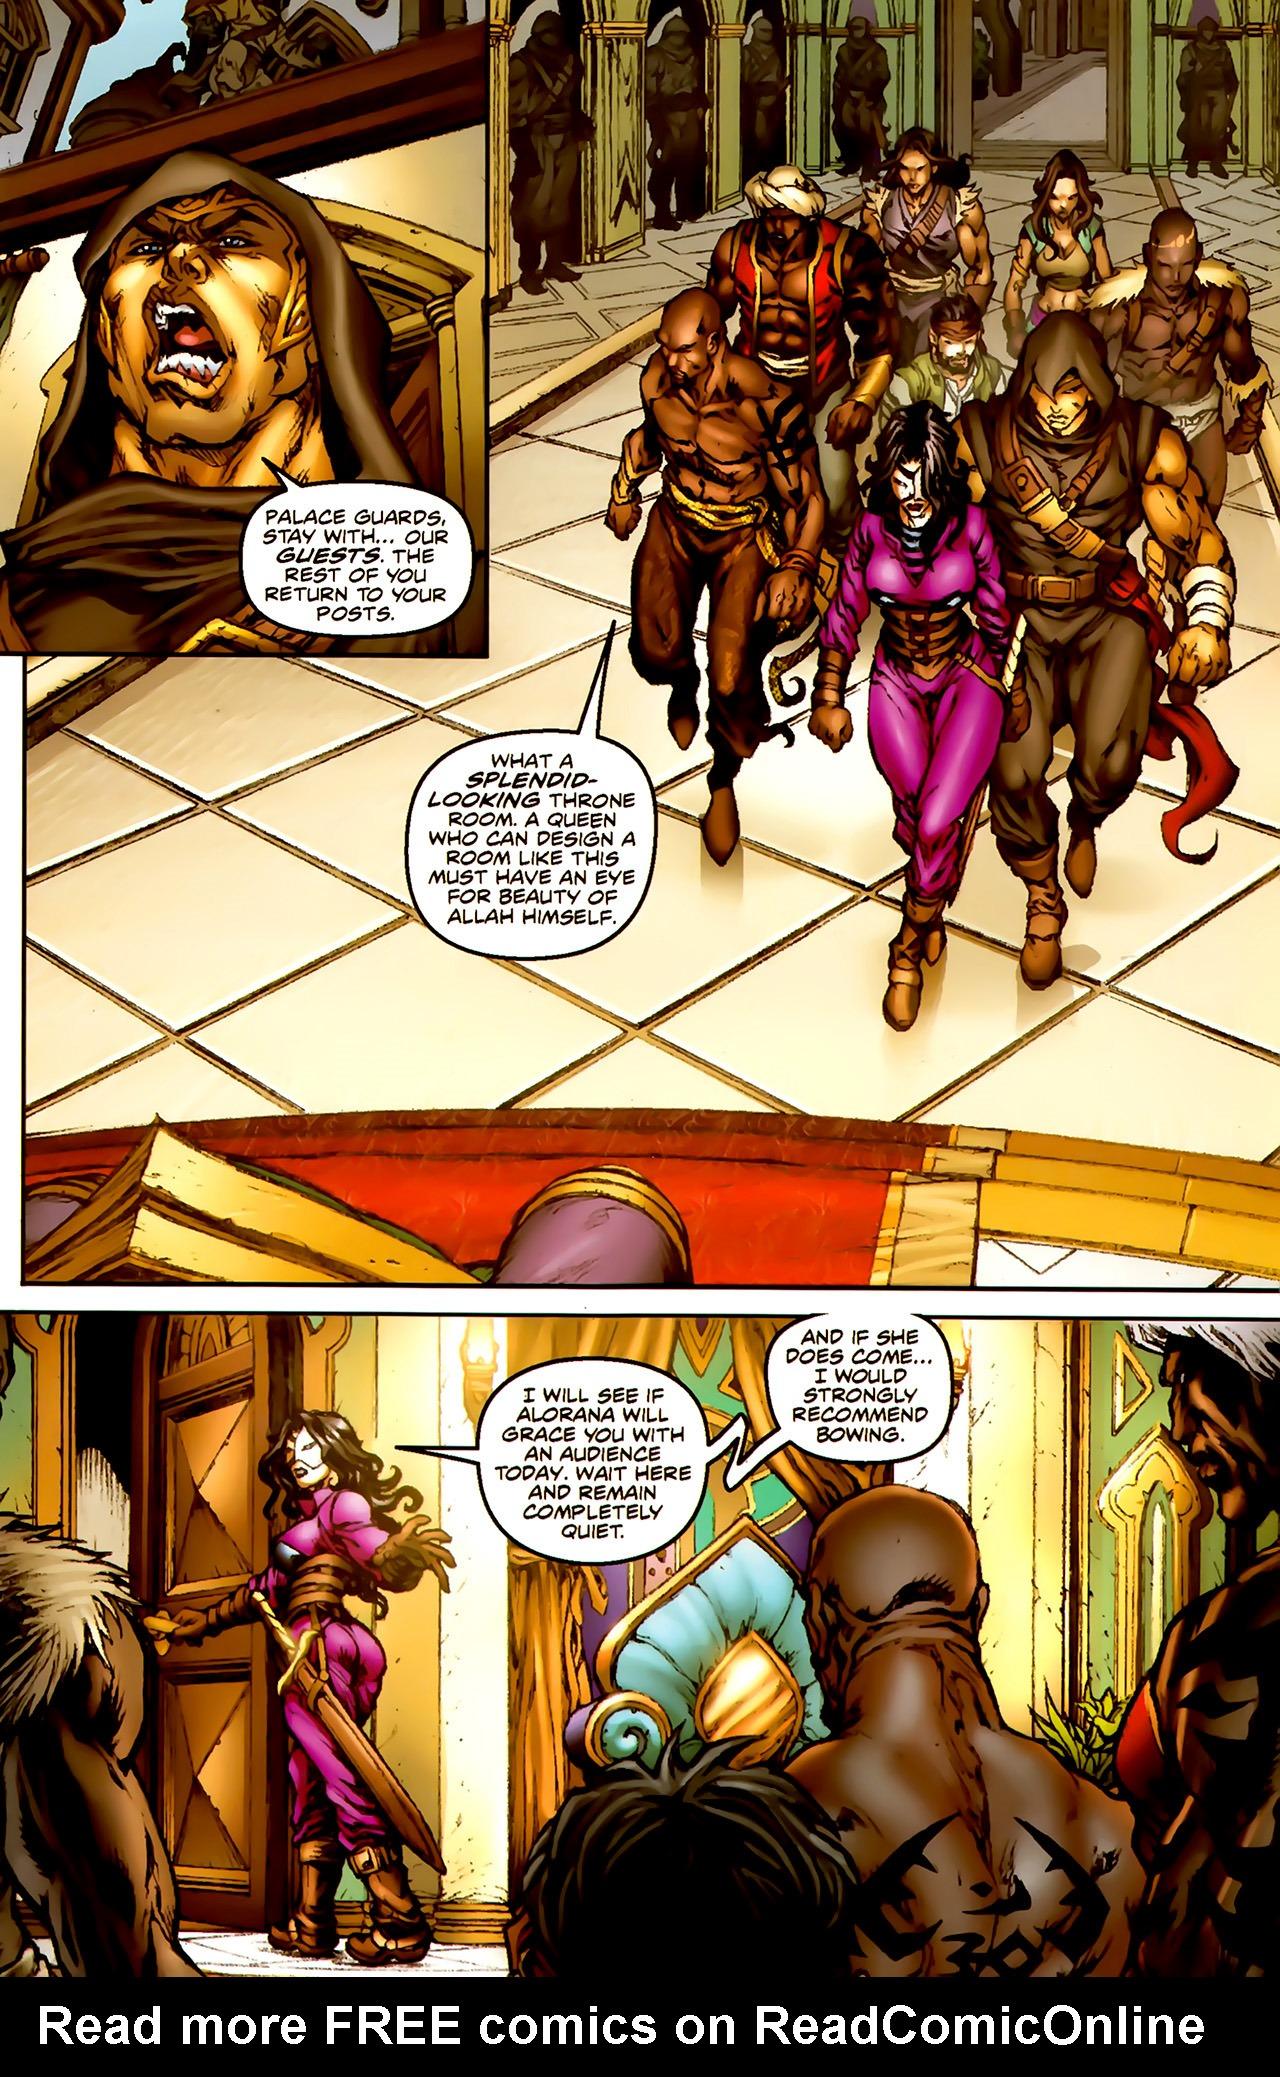 Read online 1001 Arabian Nights: The Adventures of Sinbad comic -  Issue #1 - 16